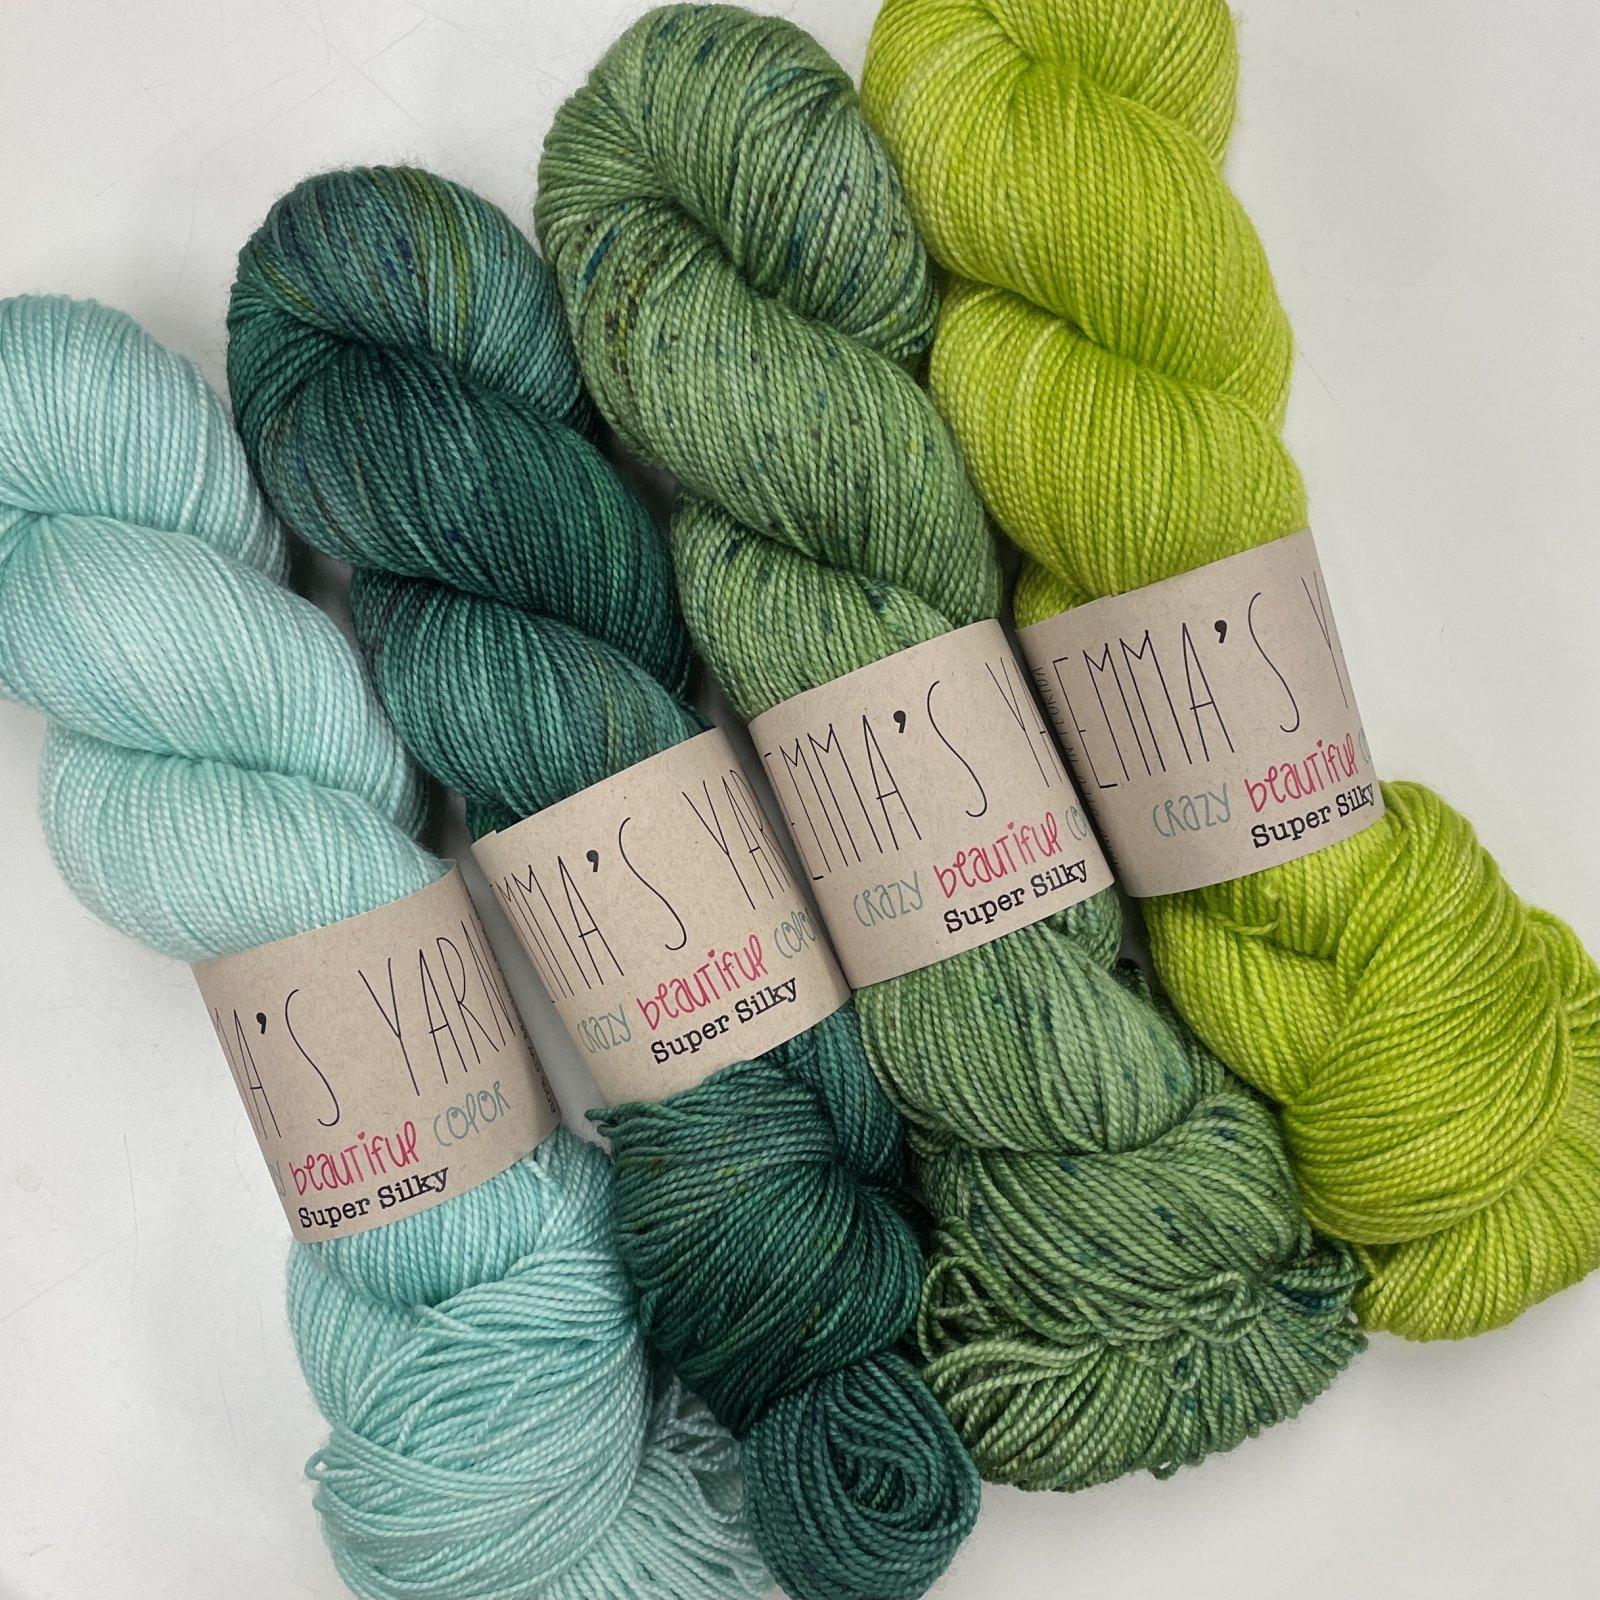 Emma's Yarn Botanique Kit